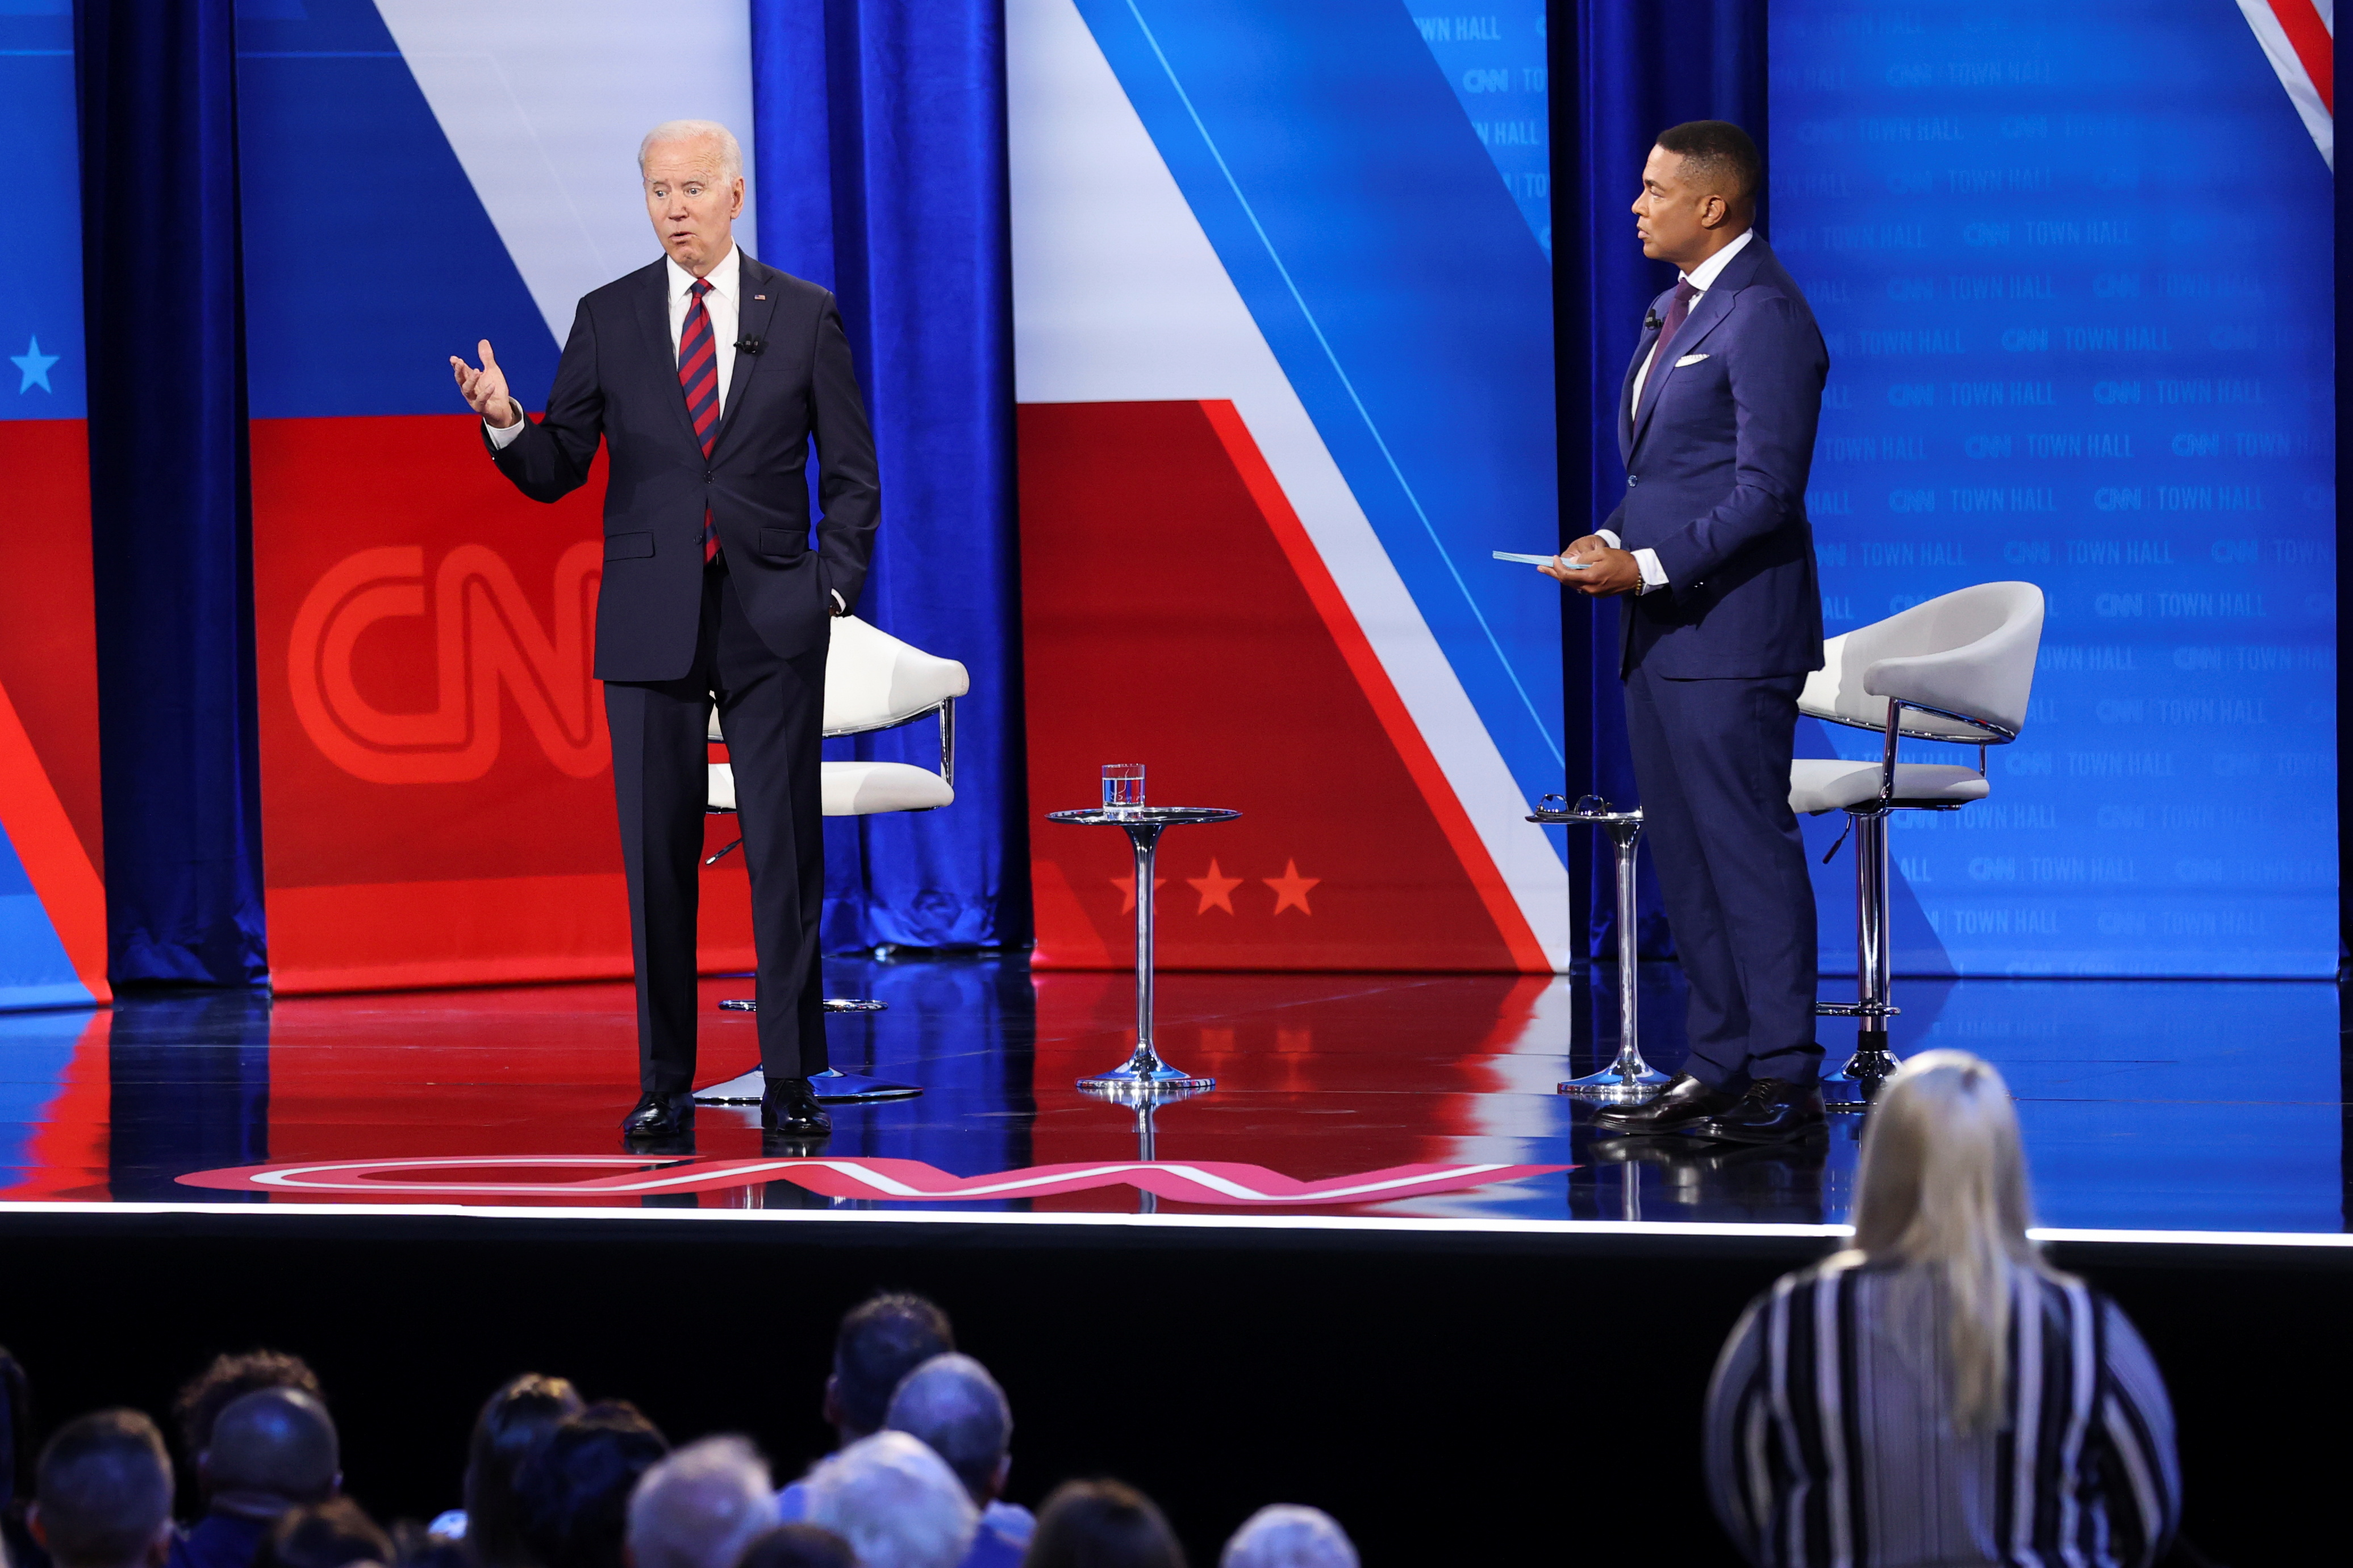 U.S. President Joe Biden participates in a town hall-style interview at Mount St. Joseph University in Cincinnati, Ohio, U.S. July 21, 2021. REUTERS/Jonathan Ernst